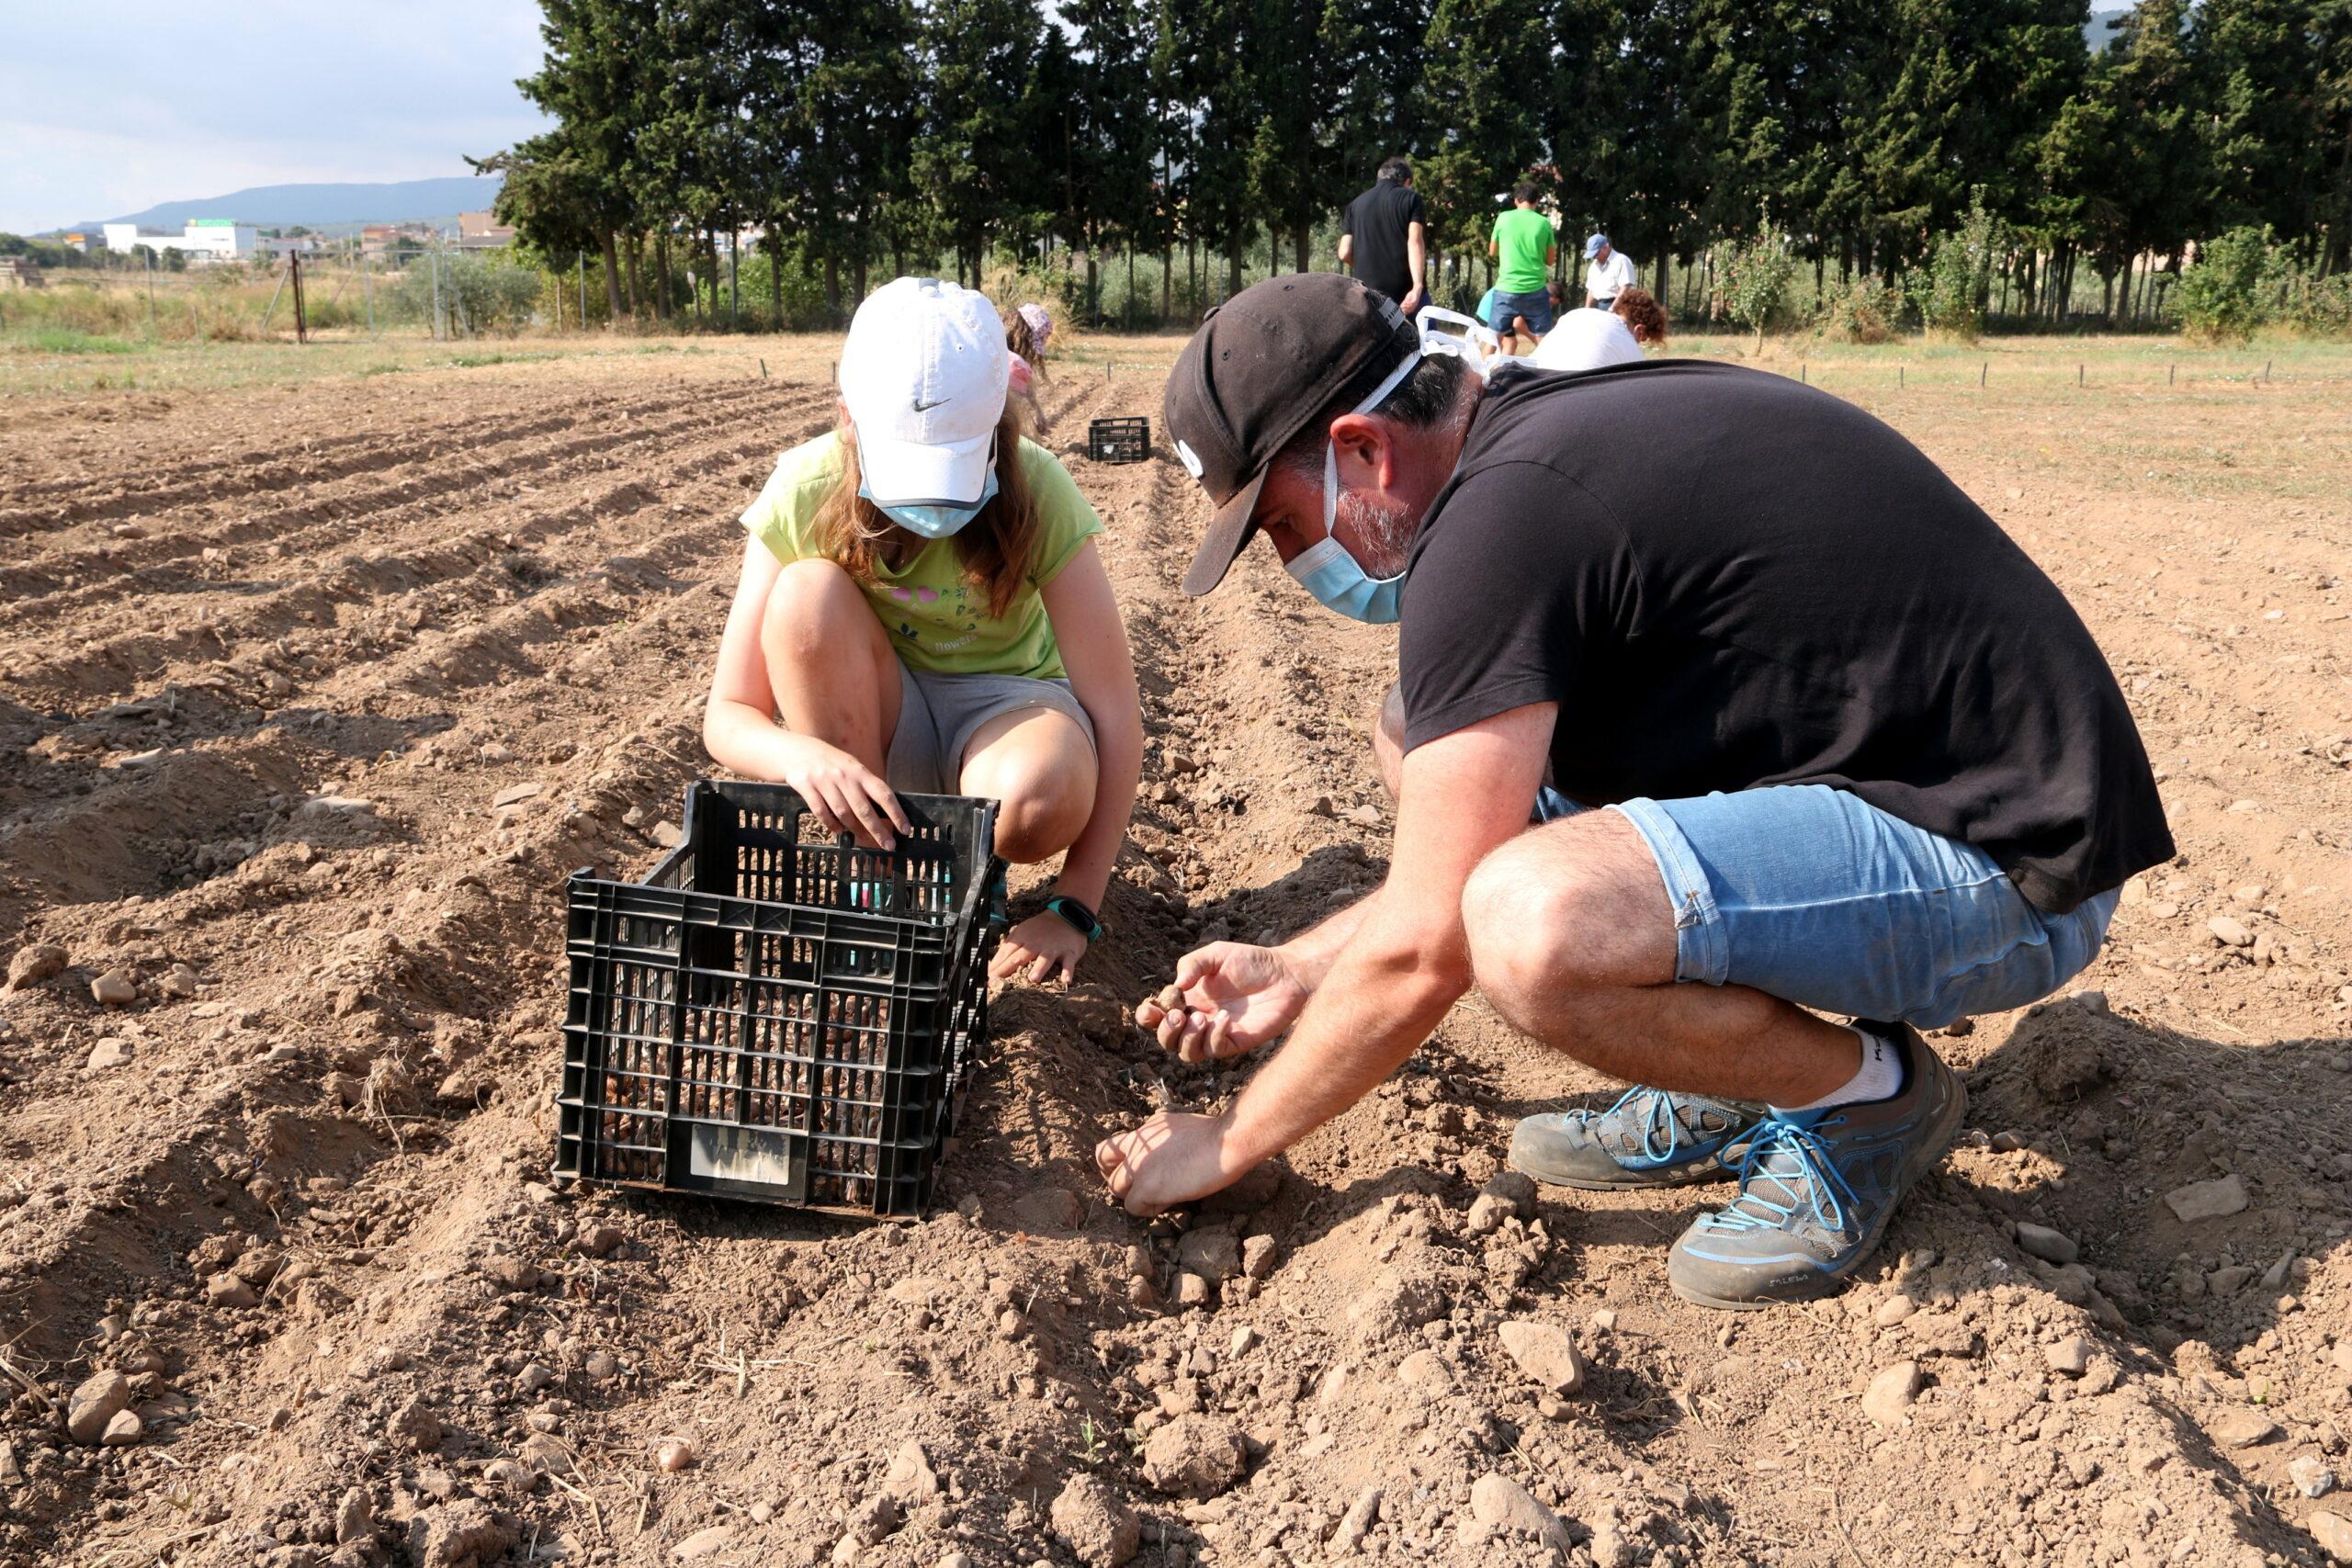 Dues persones plantant safrà en la plantada feta en una finca a Montblanc   ACN